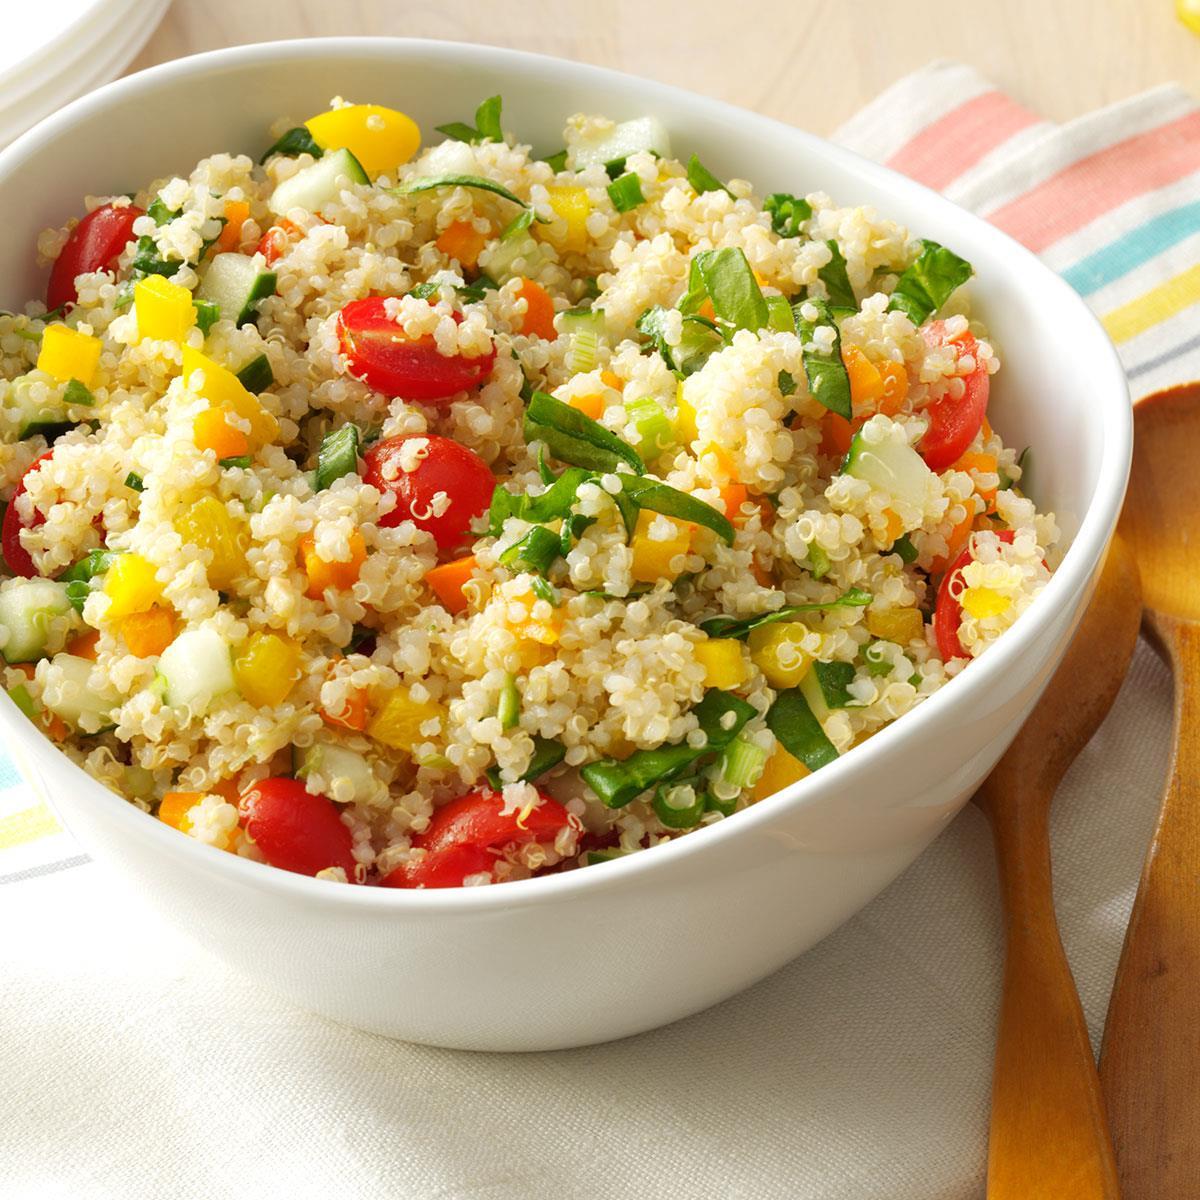 colorful-quinoa-salad_exps174640_sd143204c12_03_2b_rms